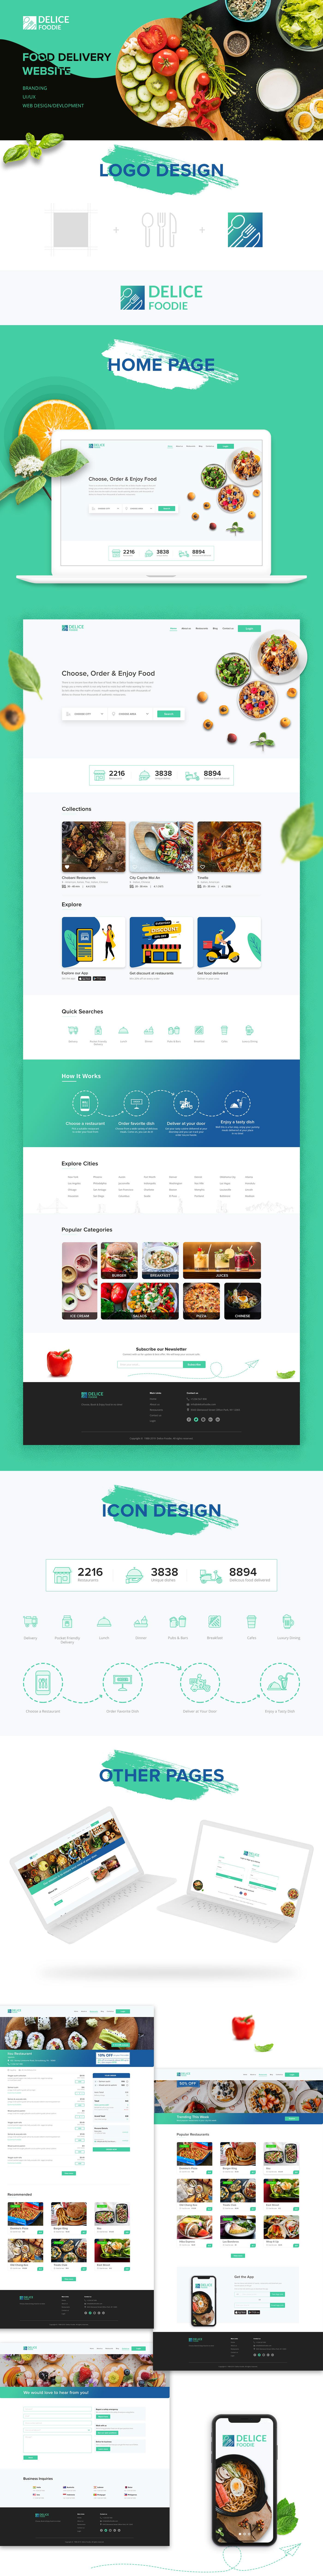 Image may contain: screenshot, abstract and fast food